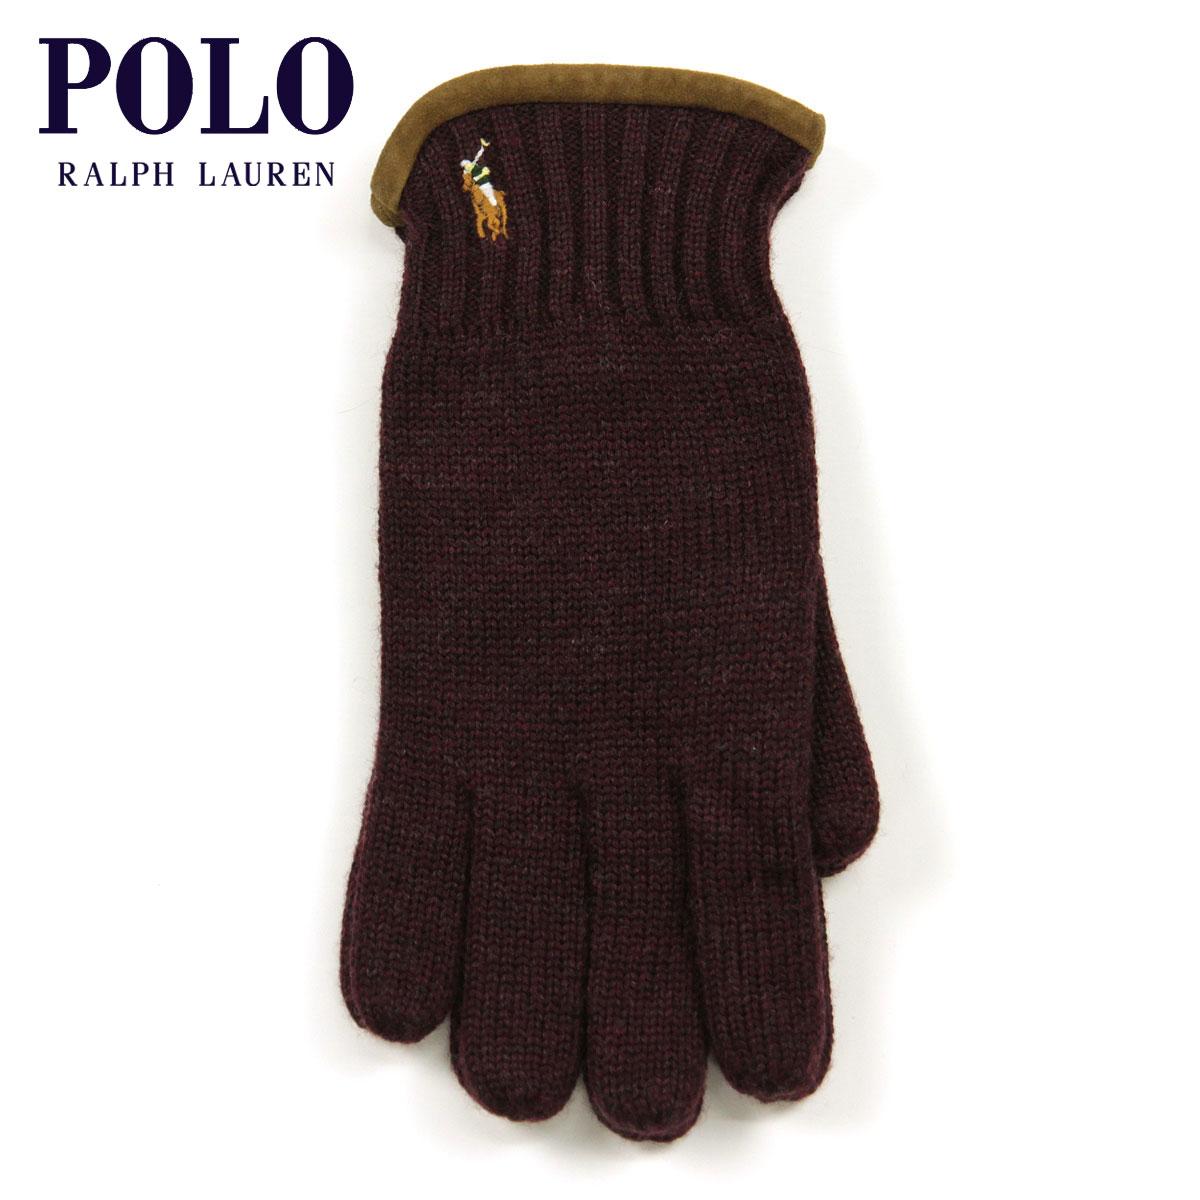 30%OFFセール 【販売期間 4/22 09:00〜4/26 09:59】 ポロ ラルフローレン POLO RALPH LAUREN 正規品 手袋 Classic Merino Gloves BURGUNDY D20S30